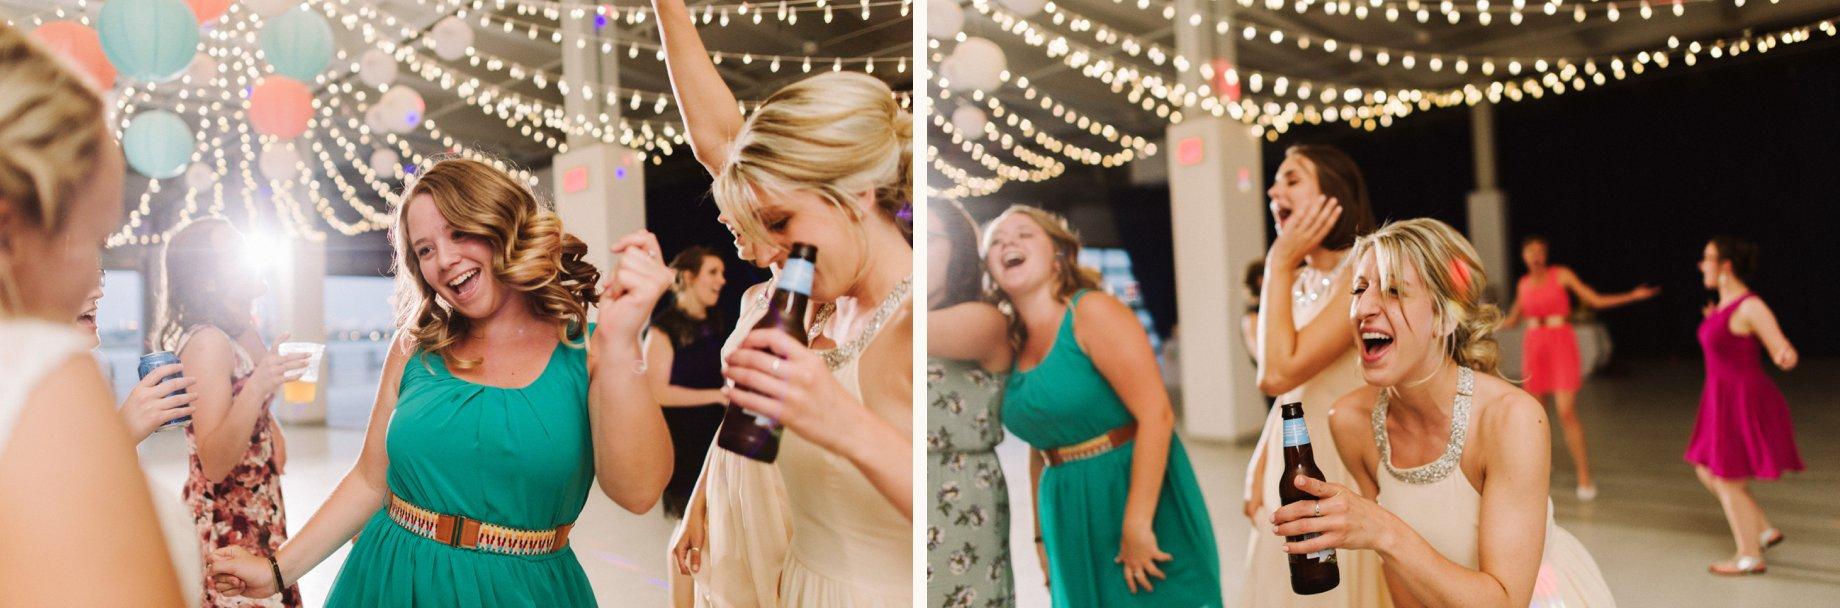 bean dock wedding